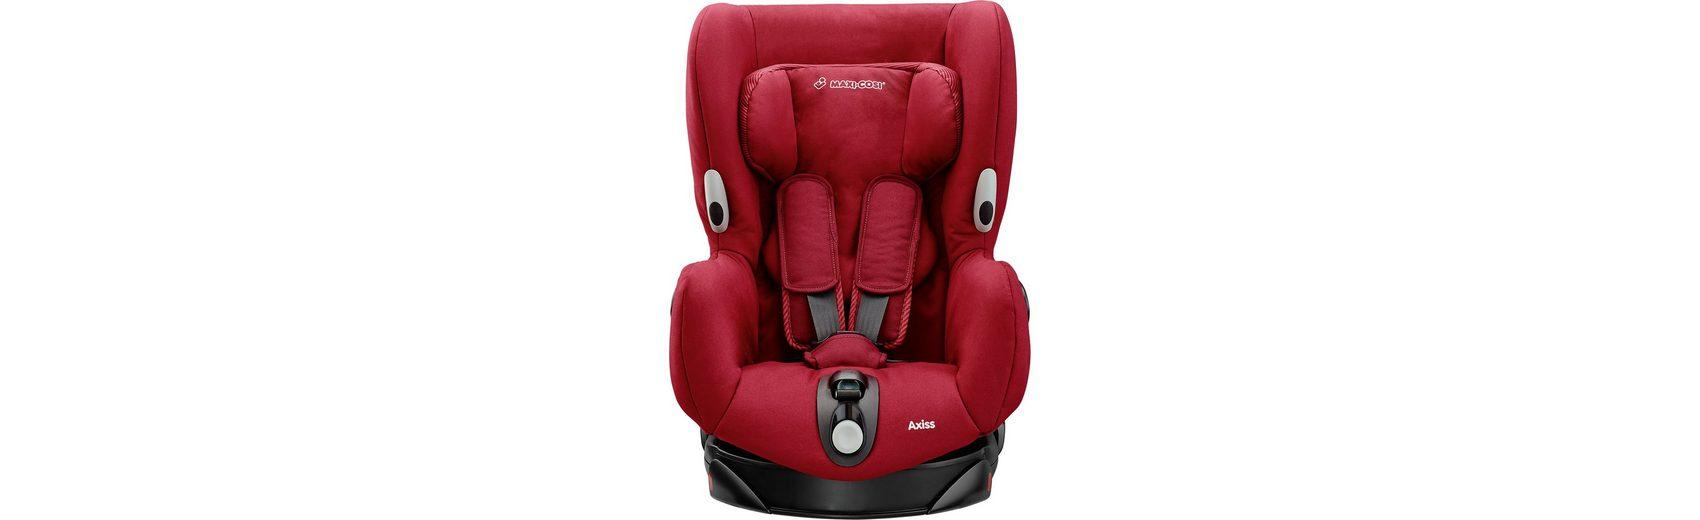 Maxi-Cosi Auto-Kindersitz Axiss, Robin Red, 2017